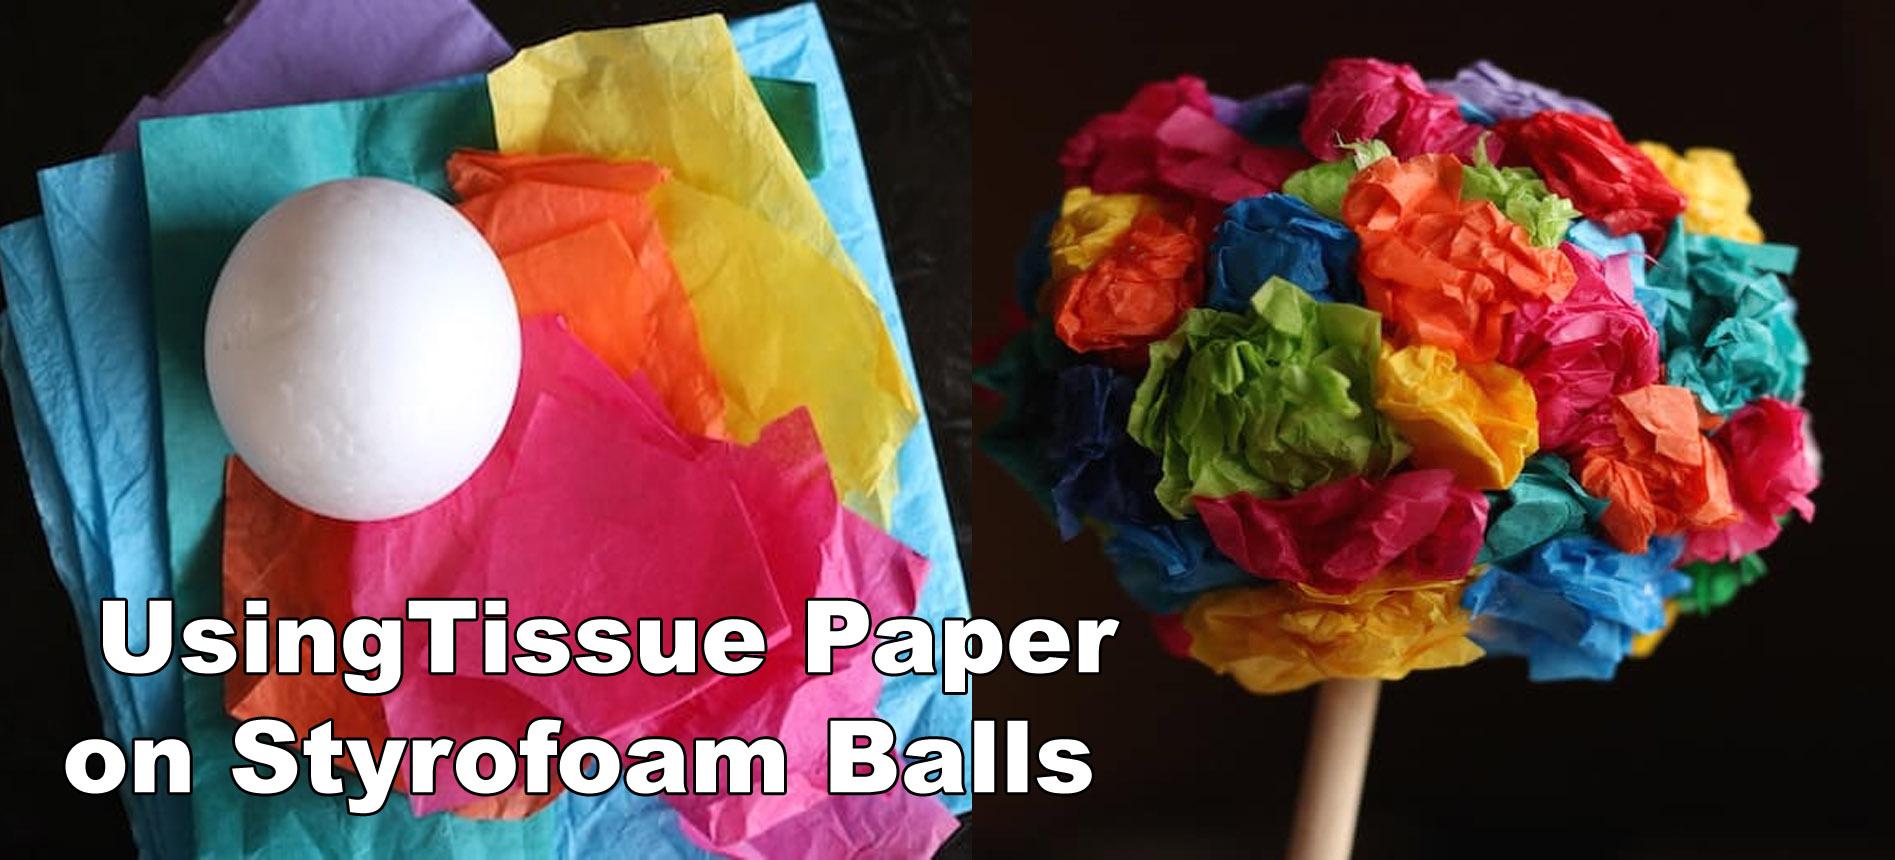 Using tissue paper on Styrofoam Balls